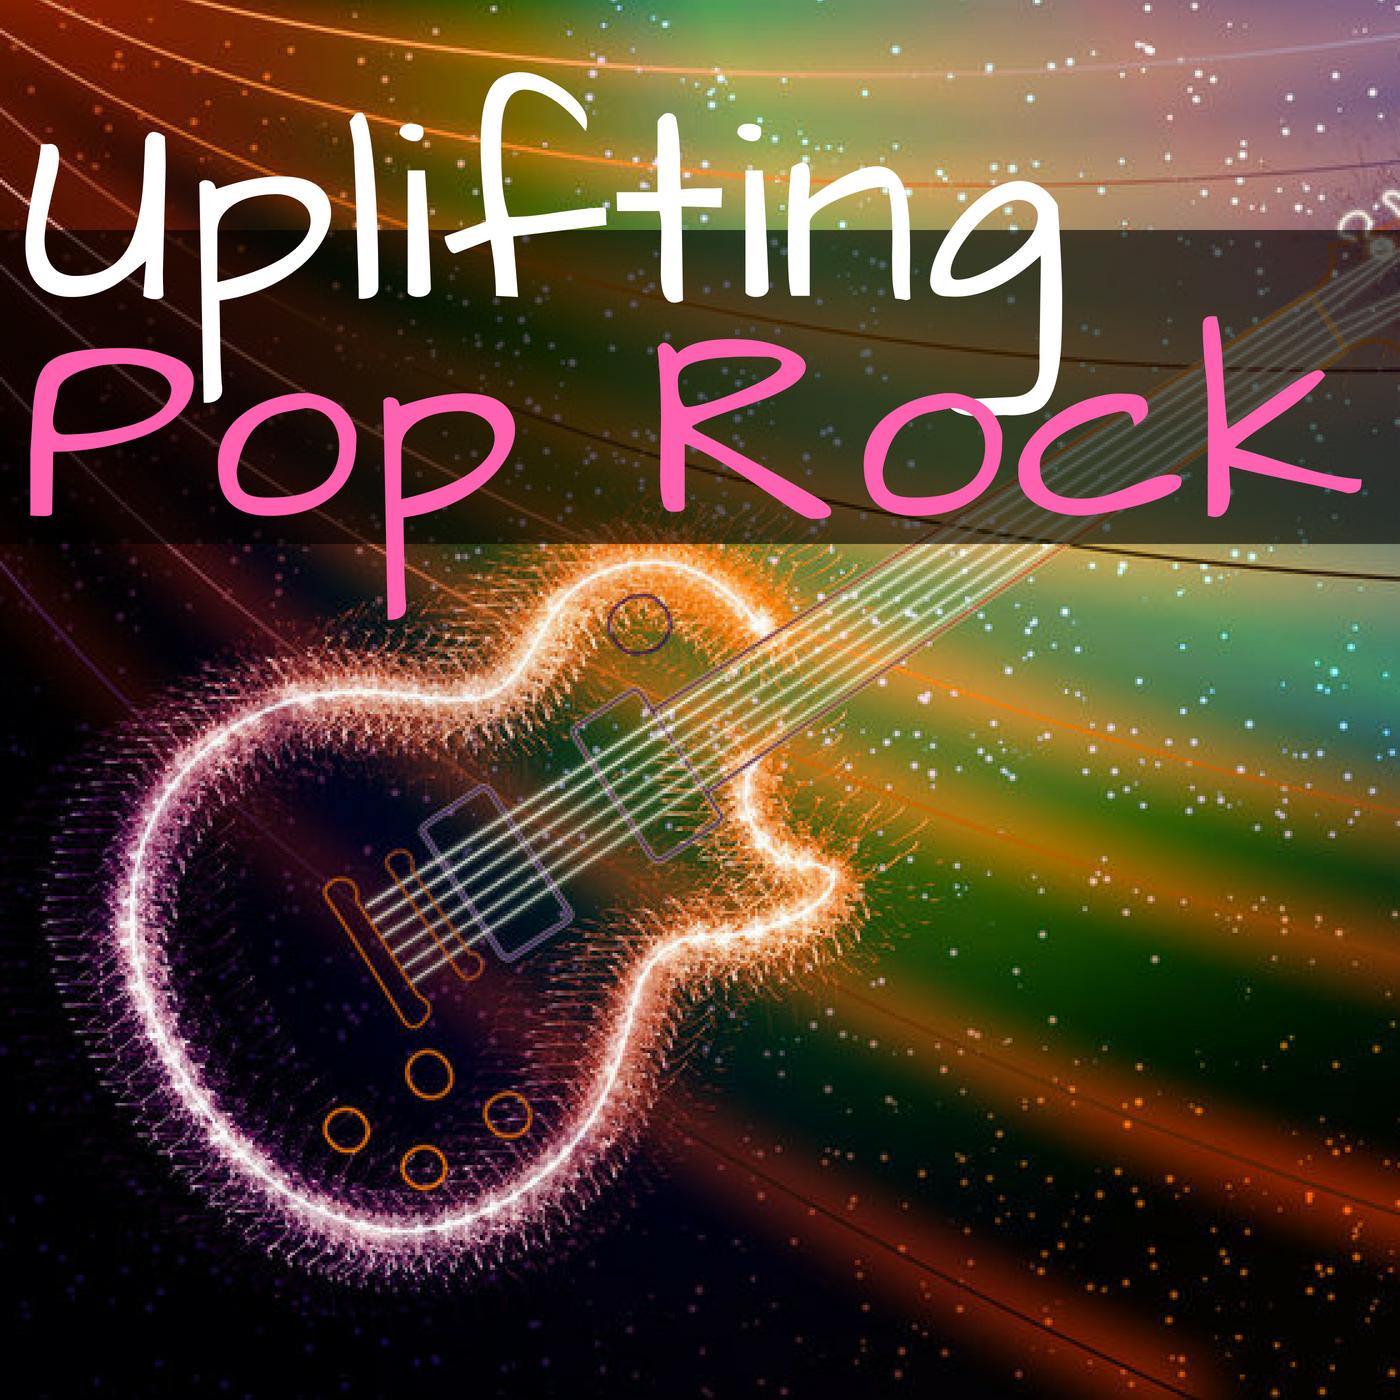 UPLIFTING POP ROCK